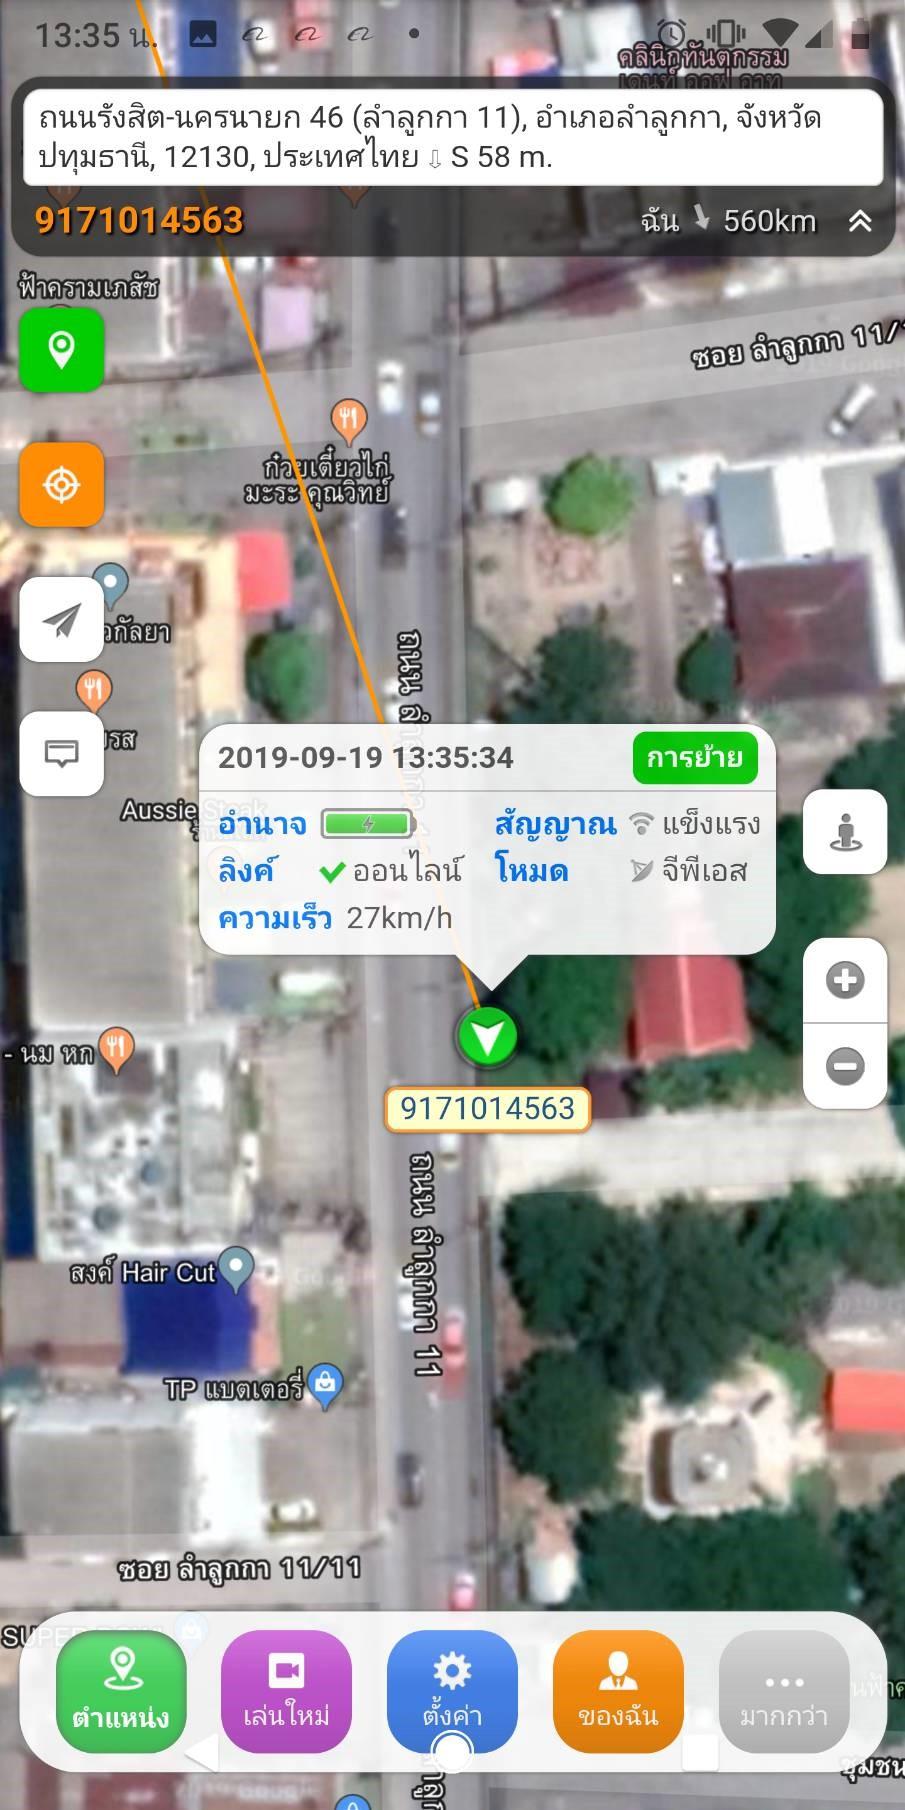 GPSติดตามรถ ไม่มีค่าบริการรายปี